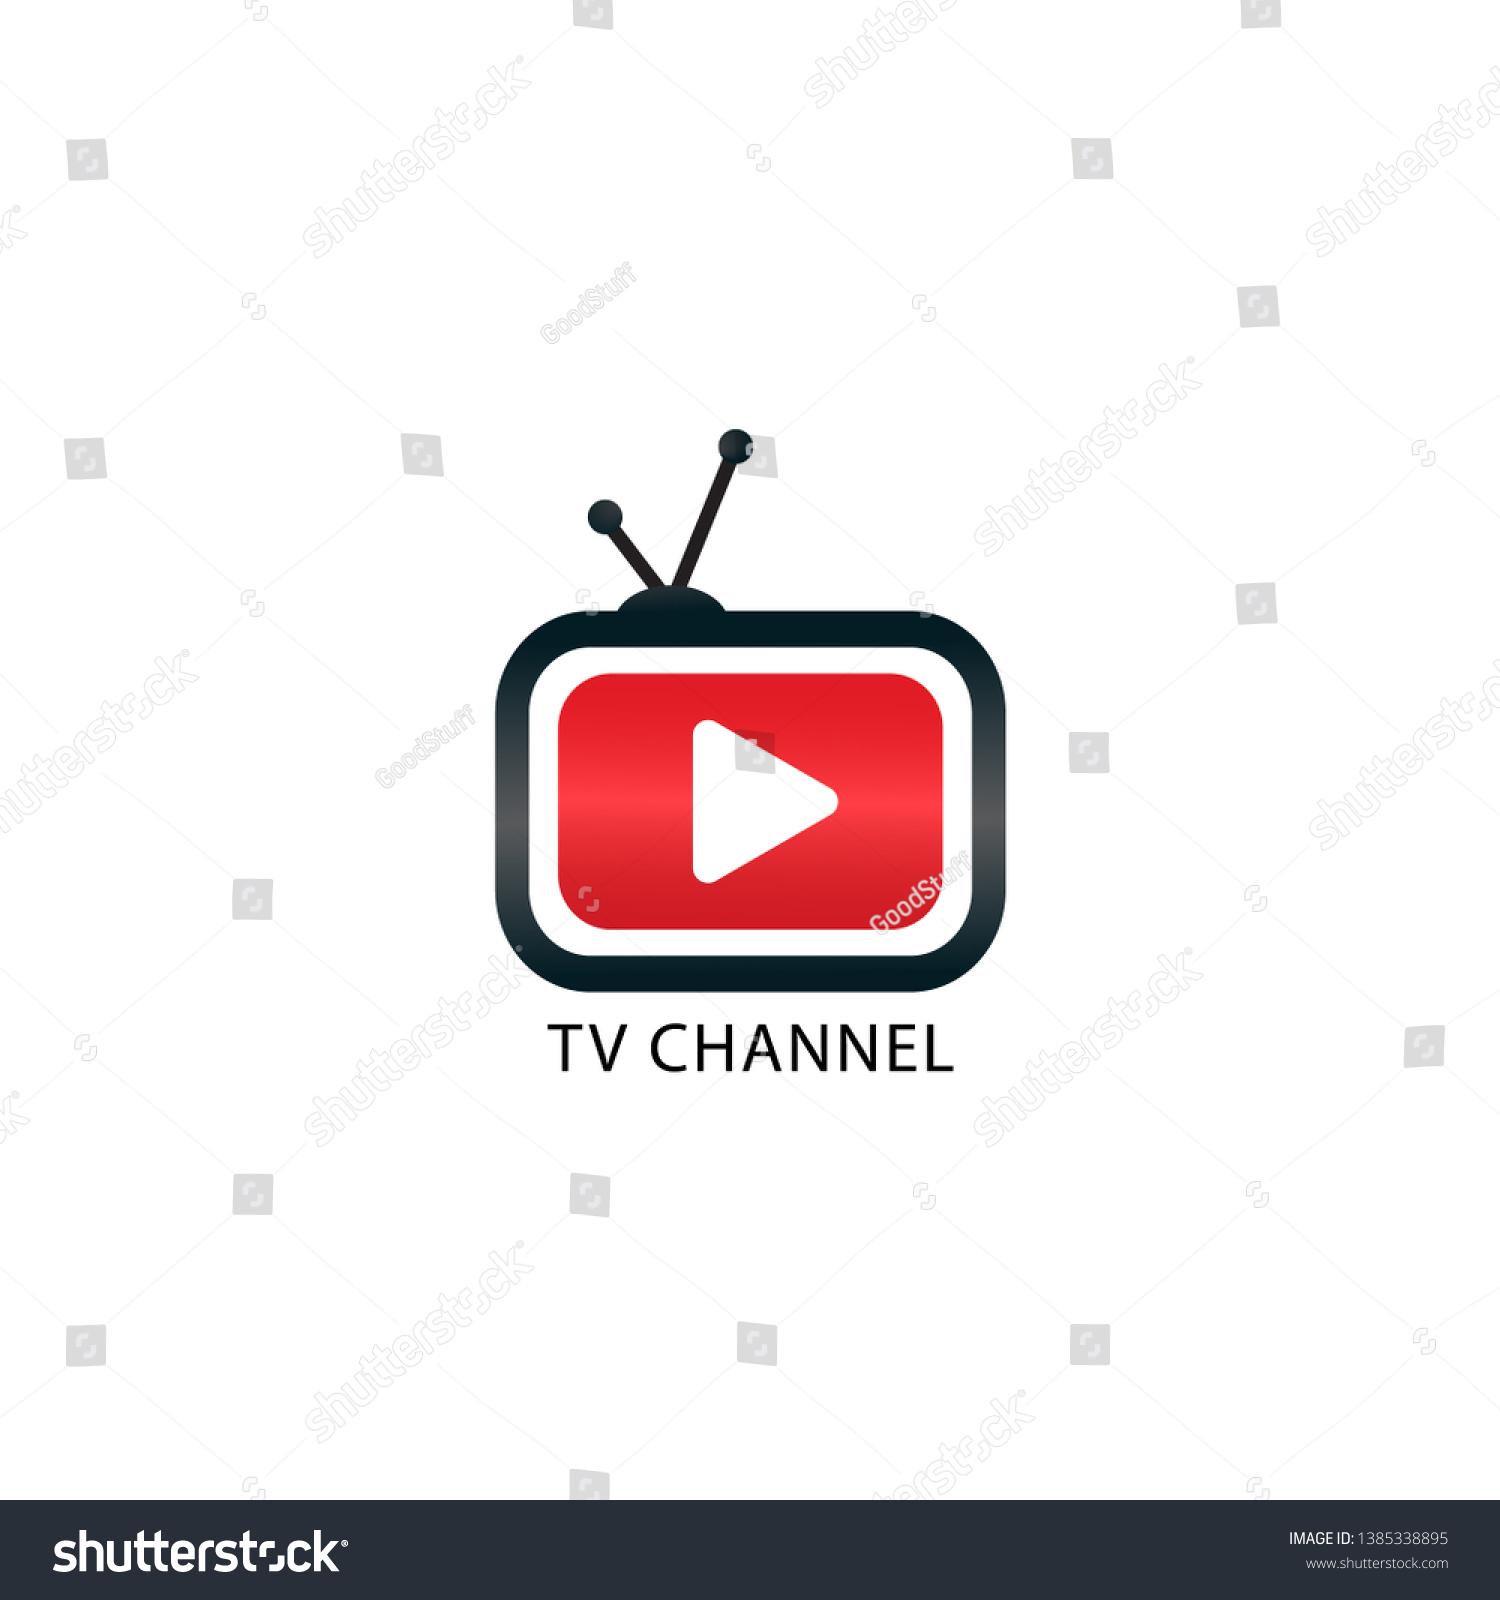 Youtube Instagram Tv Channel Logo Design Stock Vector (Royalty Free